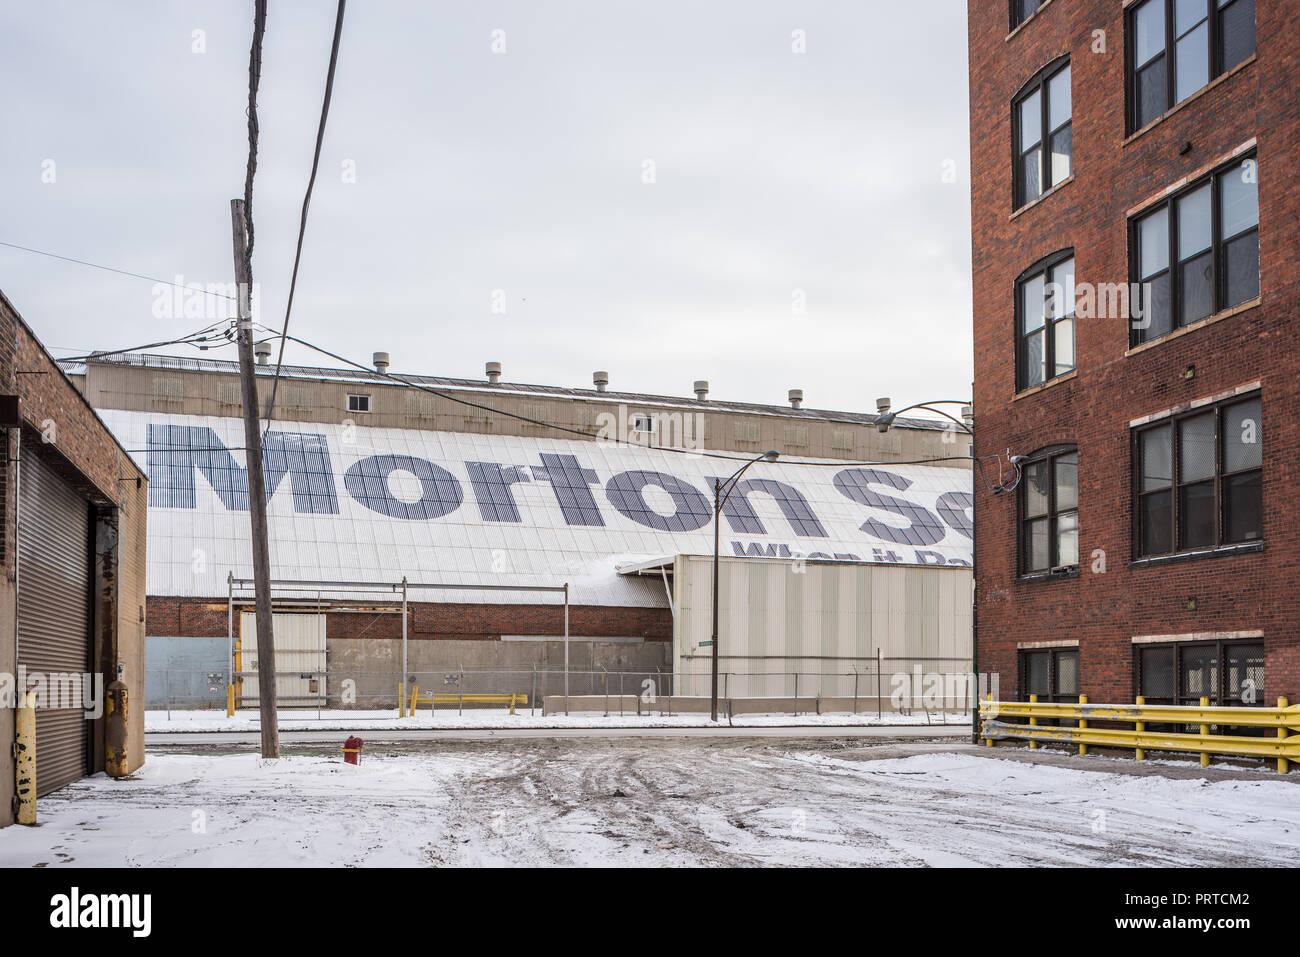 Morton Salt warehouse on Goose Island Stock Photo: 221198322